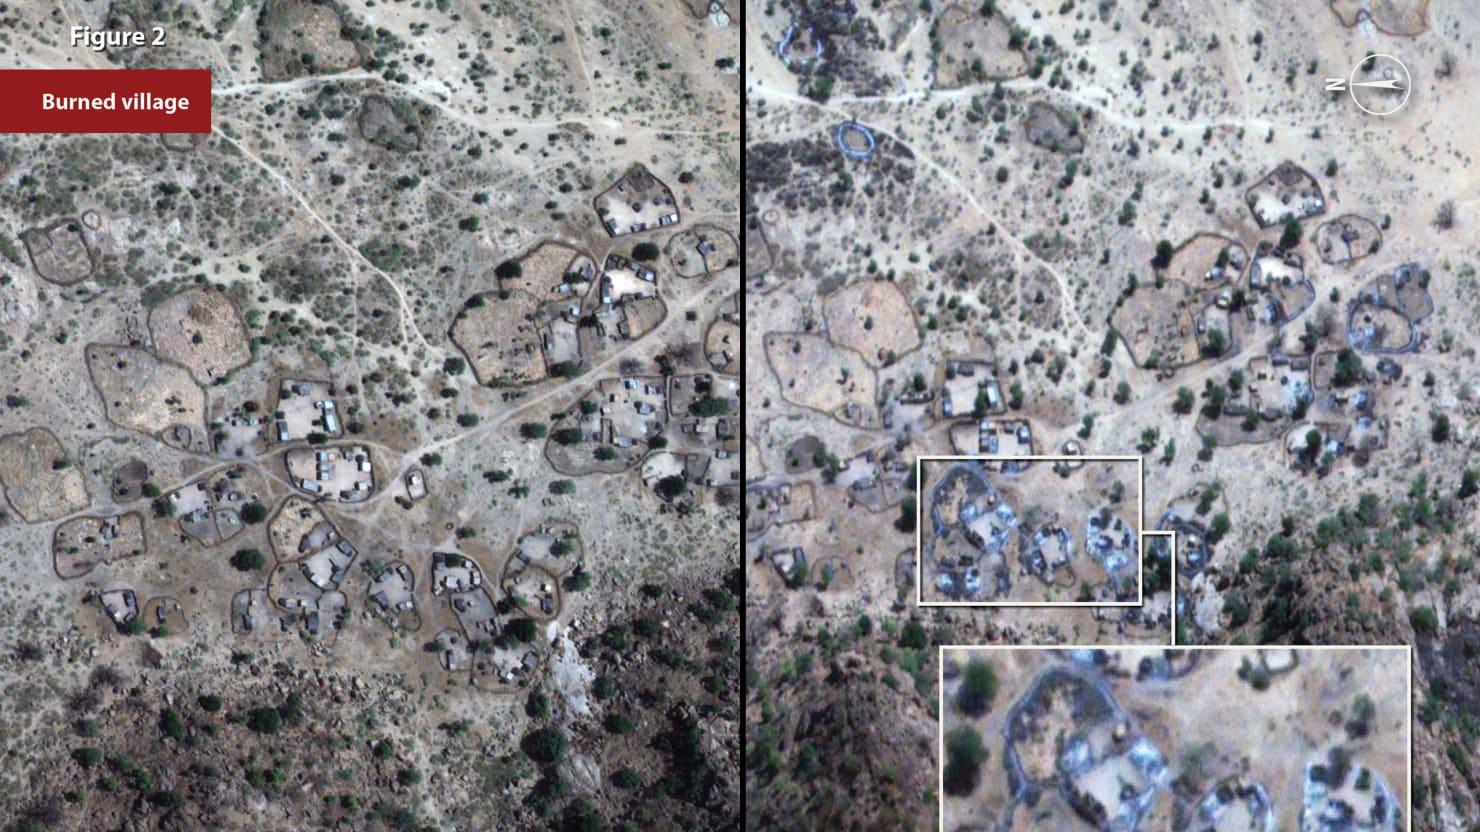 Satellites Correctly Predict Military Campaign Against Civilians in Sudan